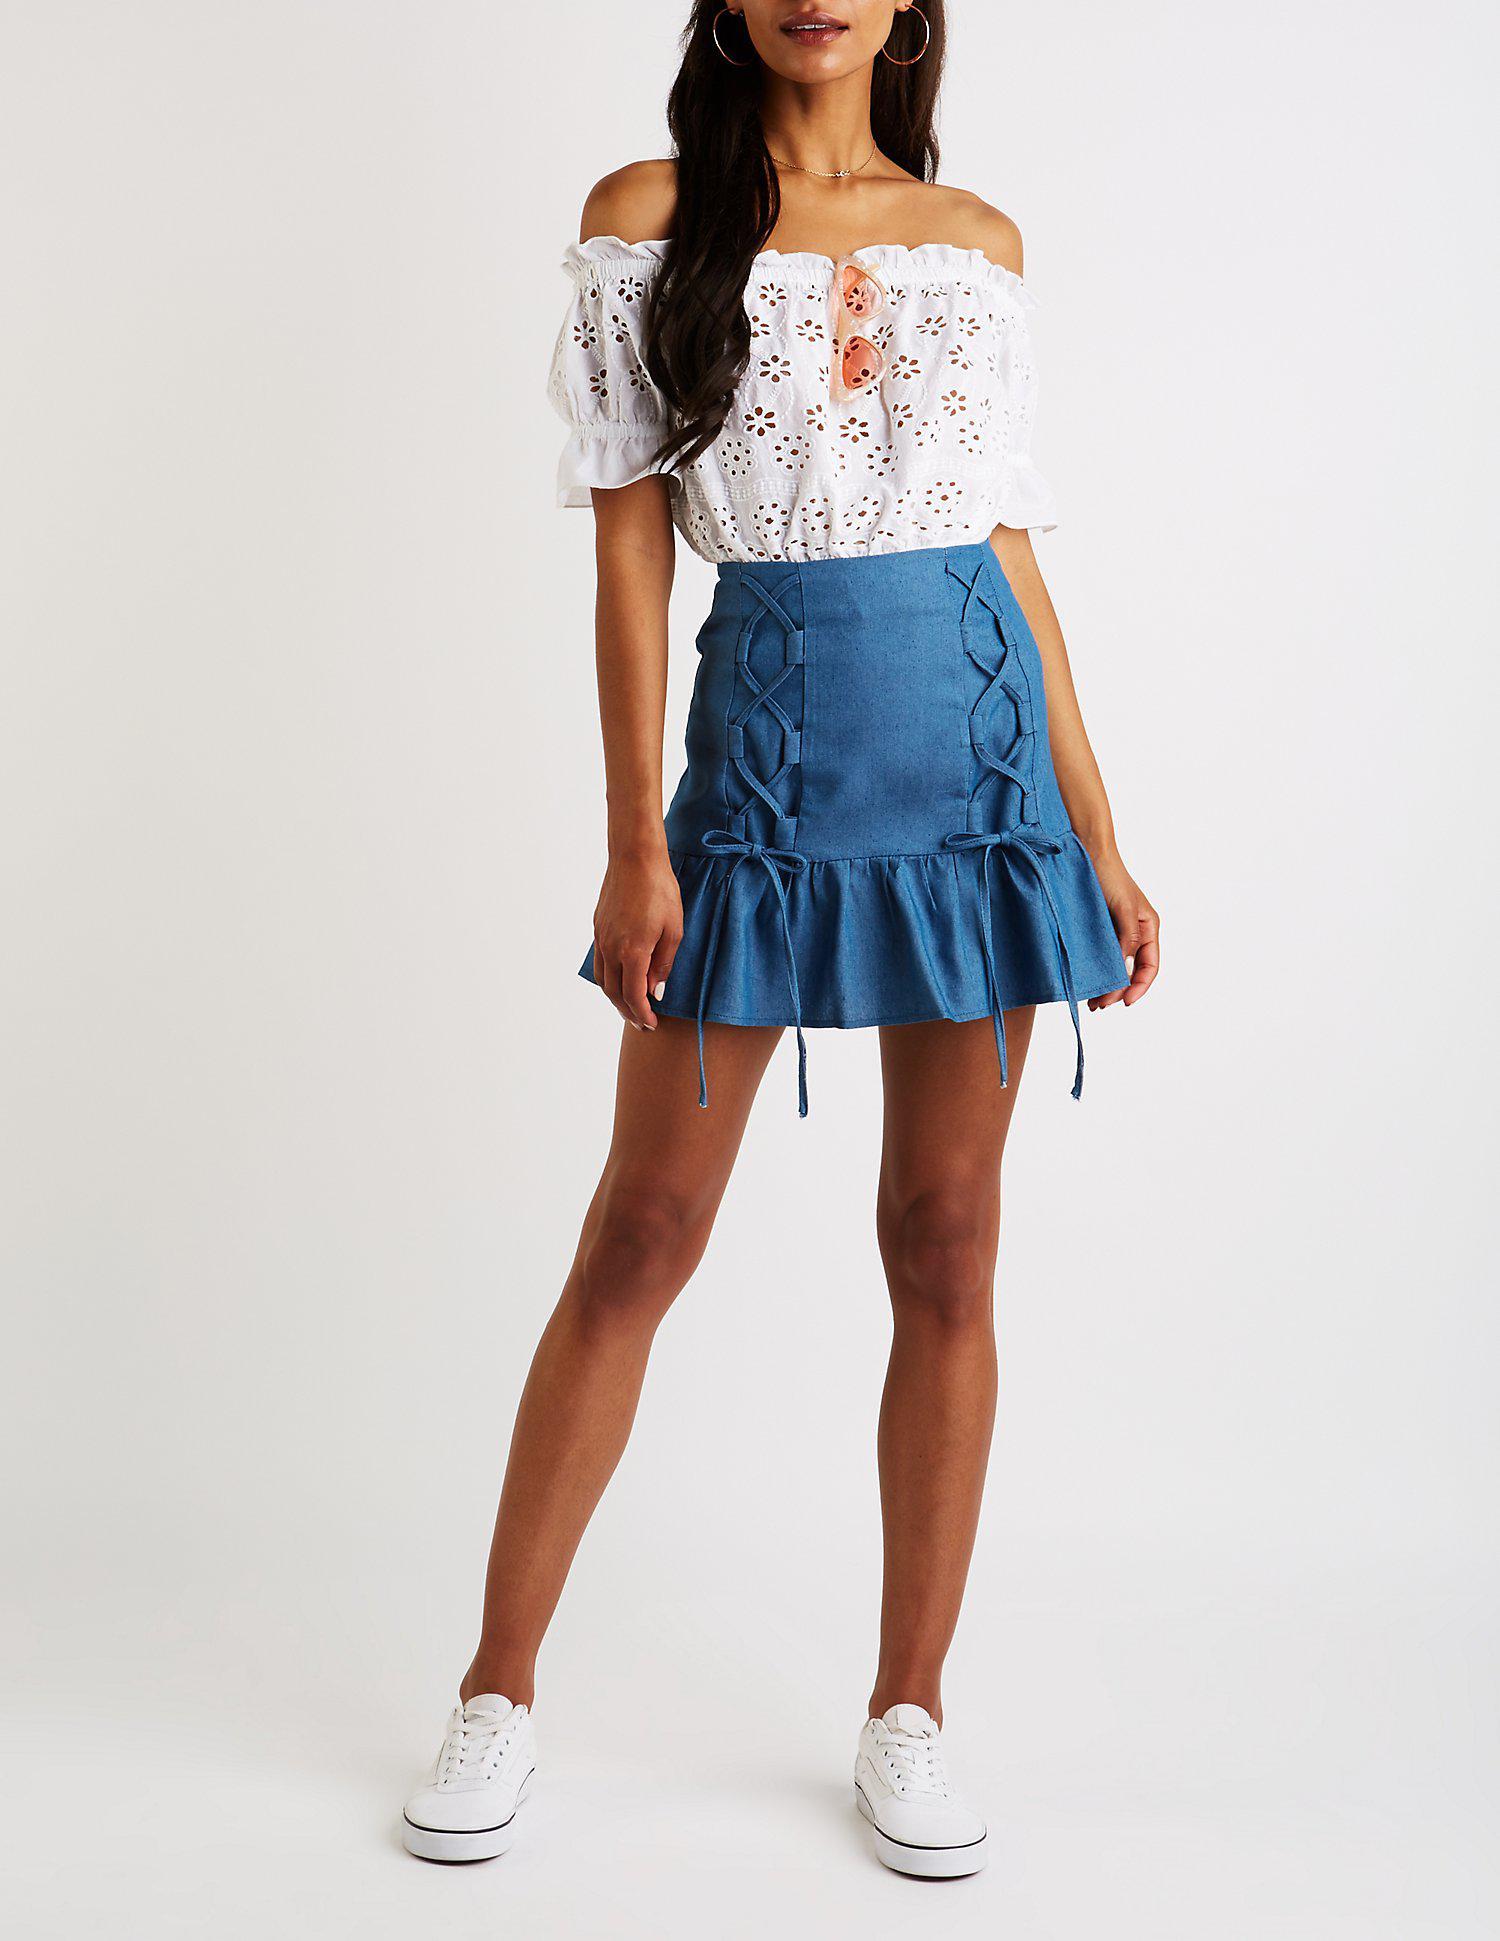 c63123f7a4 ... Blue Chambray Lace Up Mini Skirt - Lyst. View fullscreen